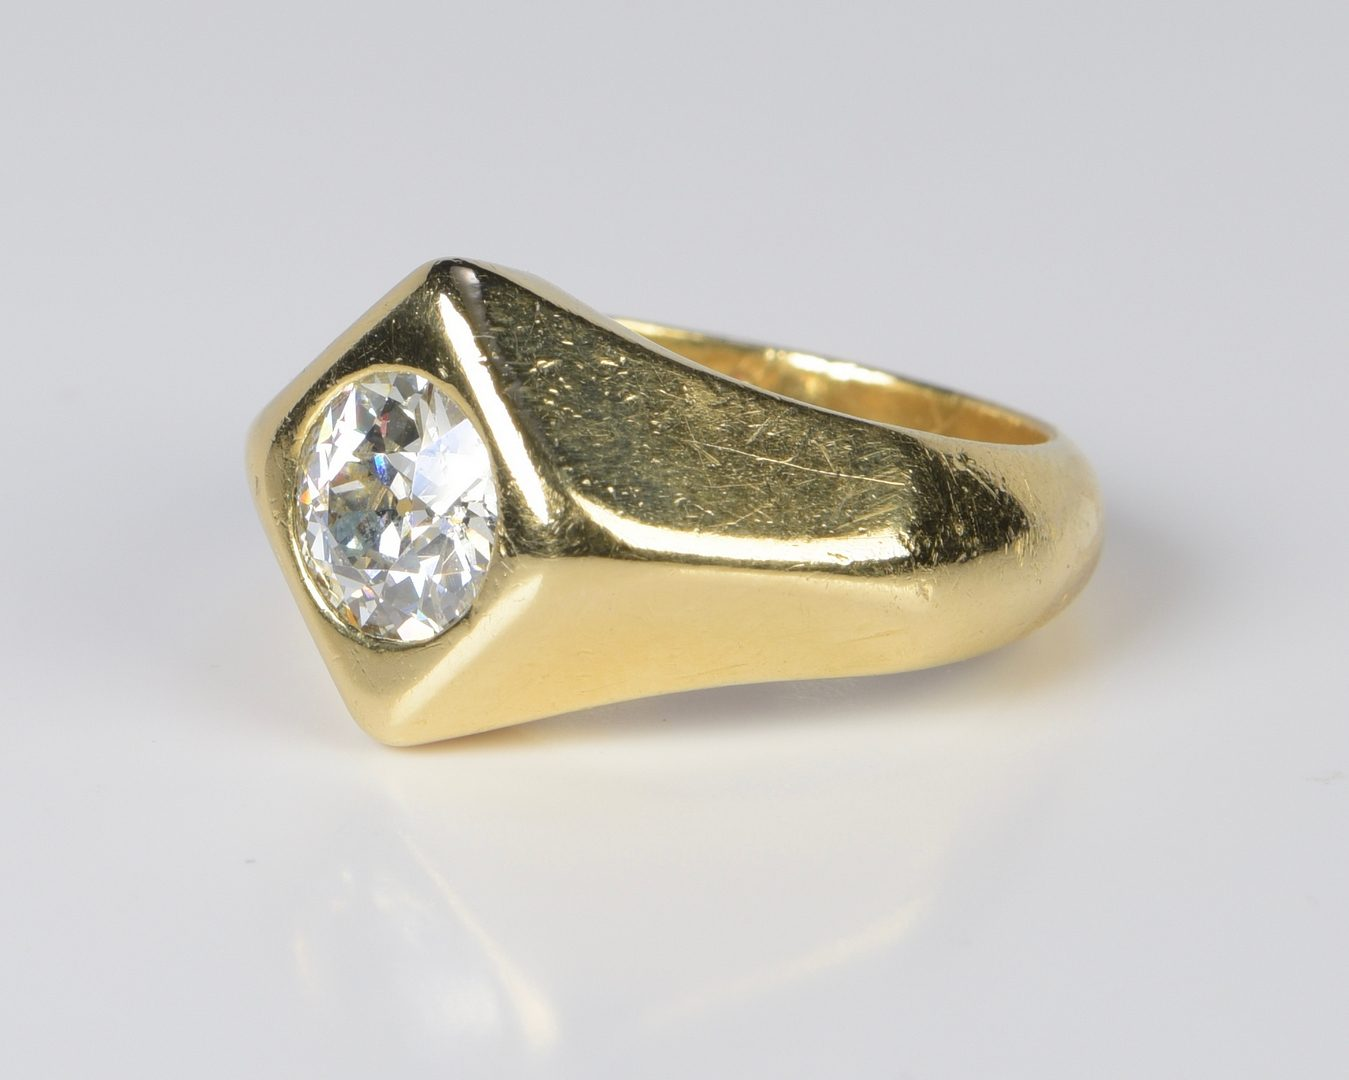 Lot 398: Gent's 14K 1.57 ct OEC Diamond Ring